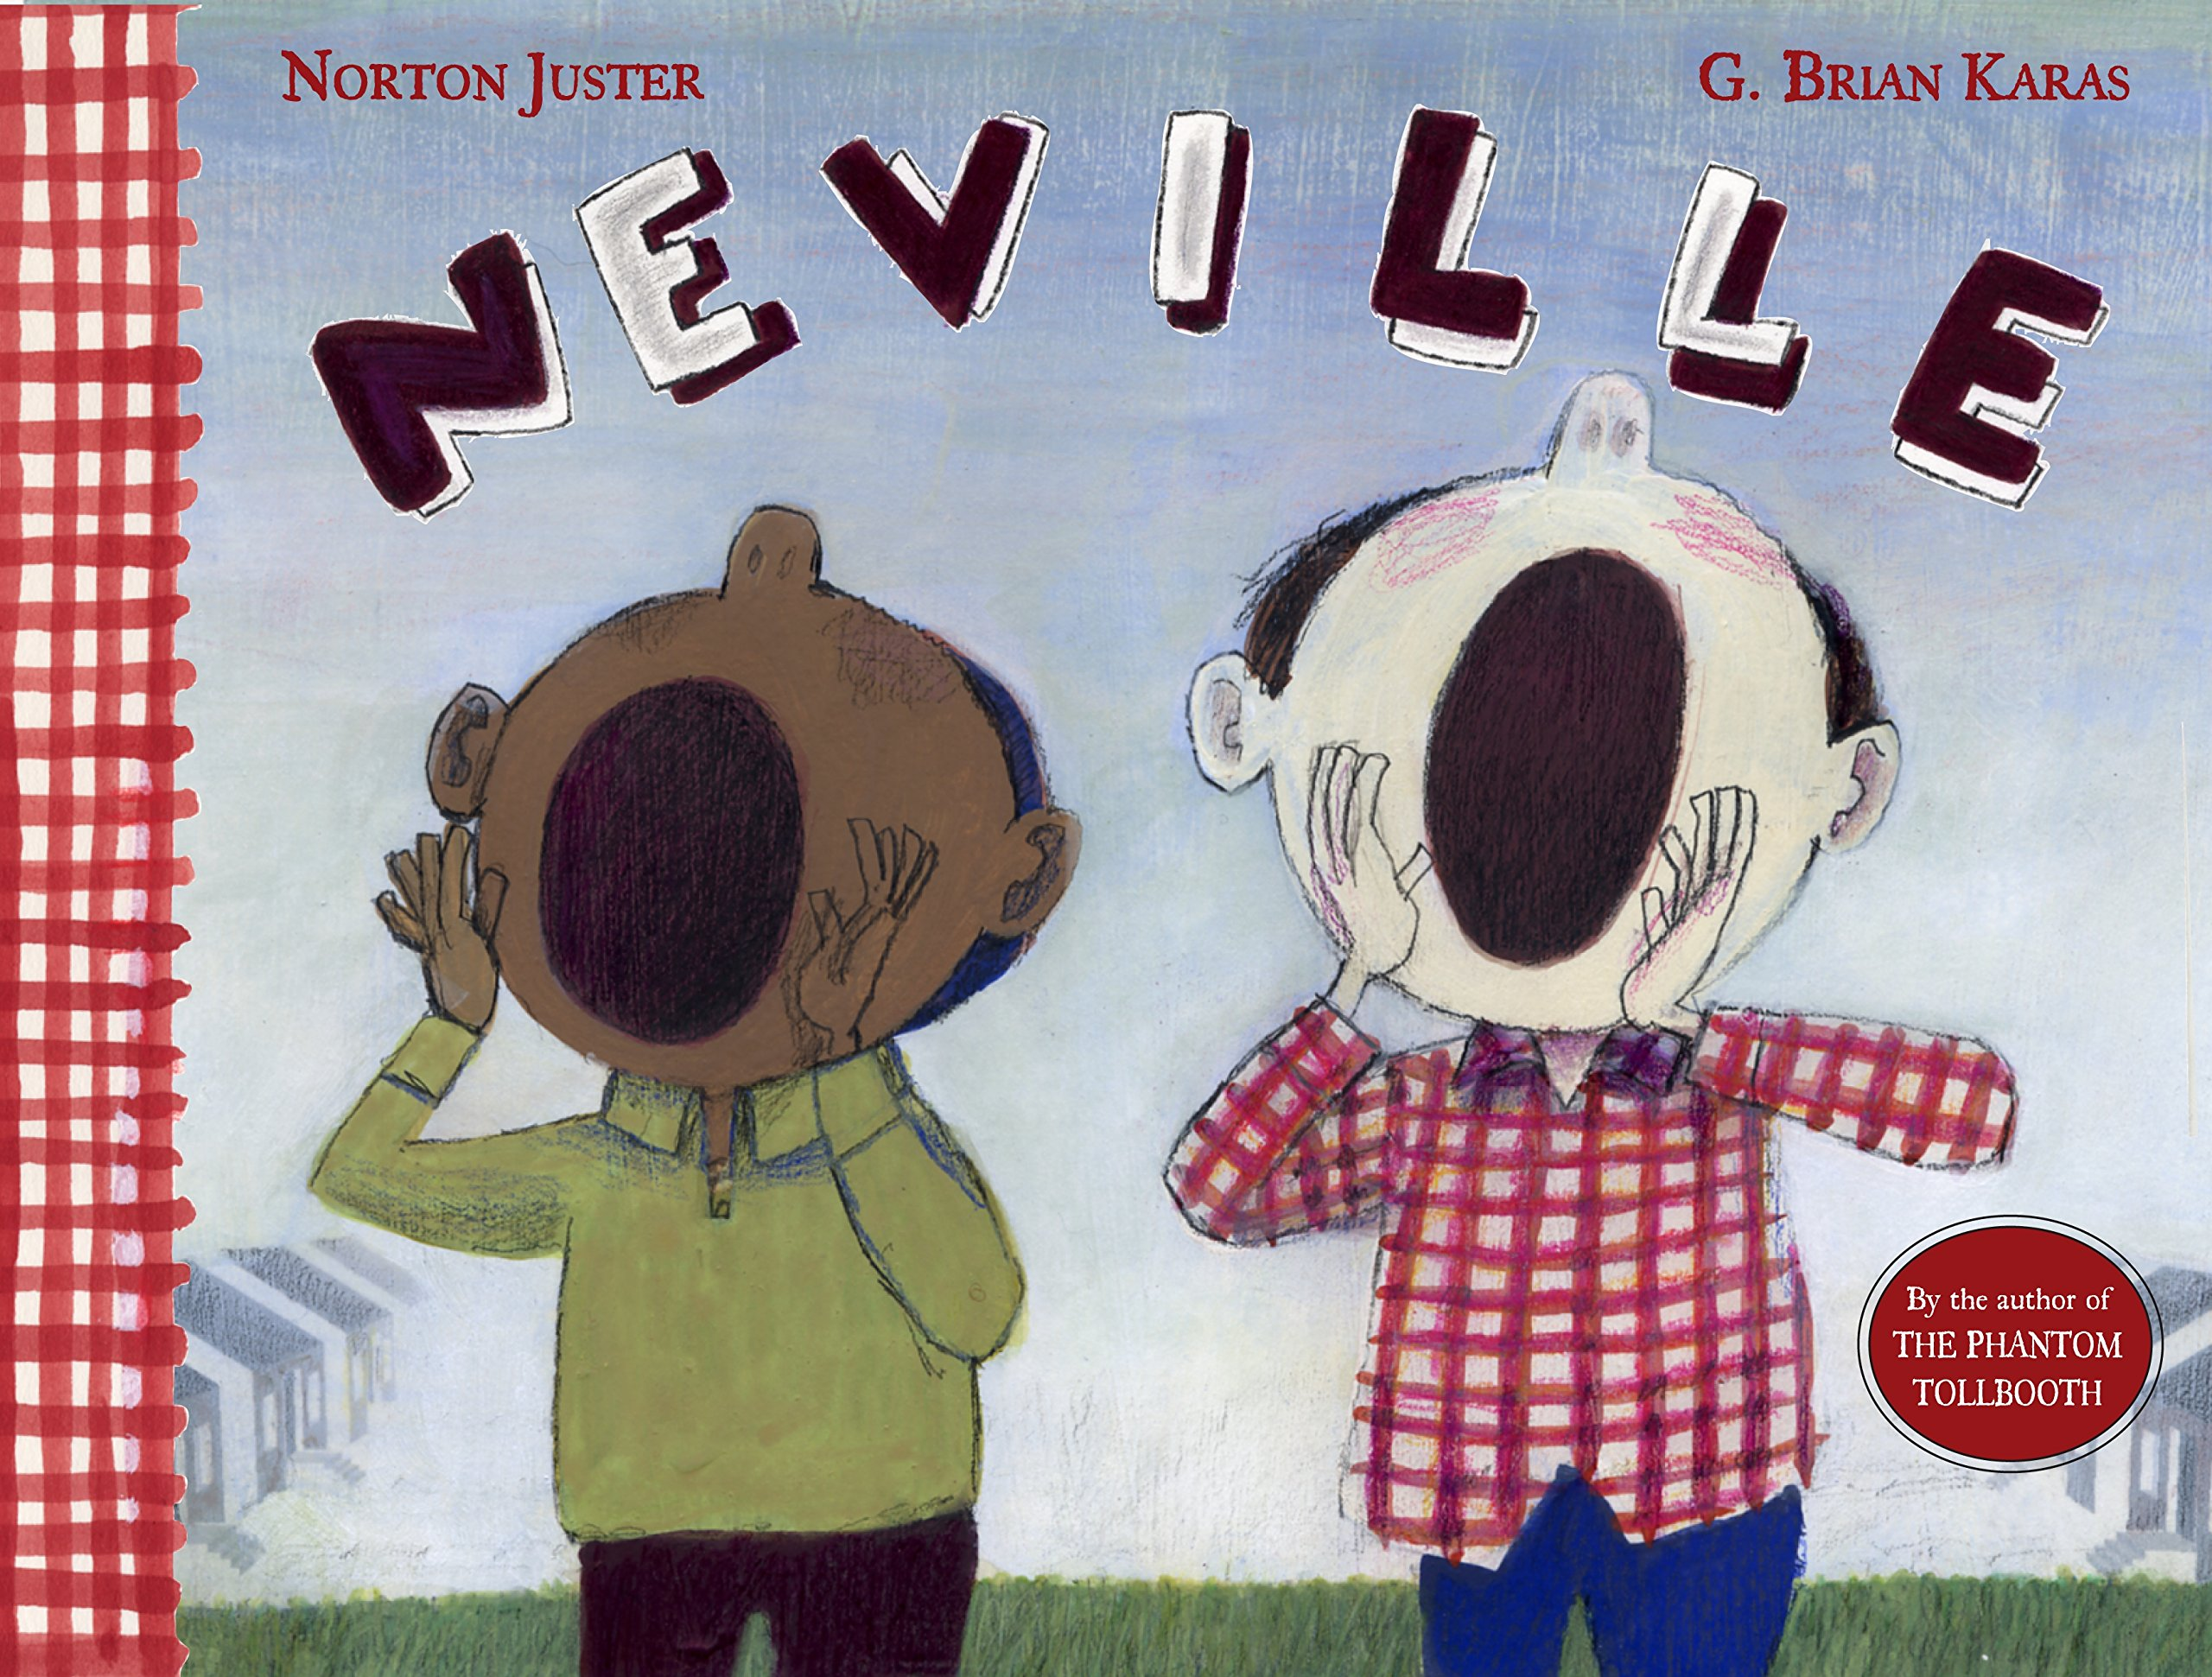 celebrate-picture-books-picture-book-review-neville-cover